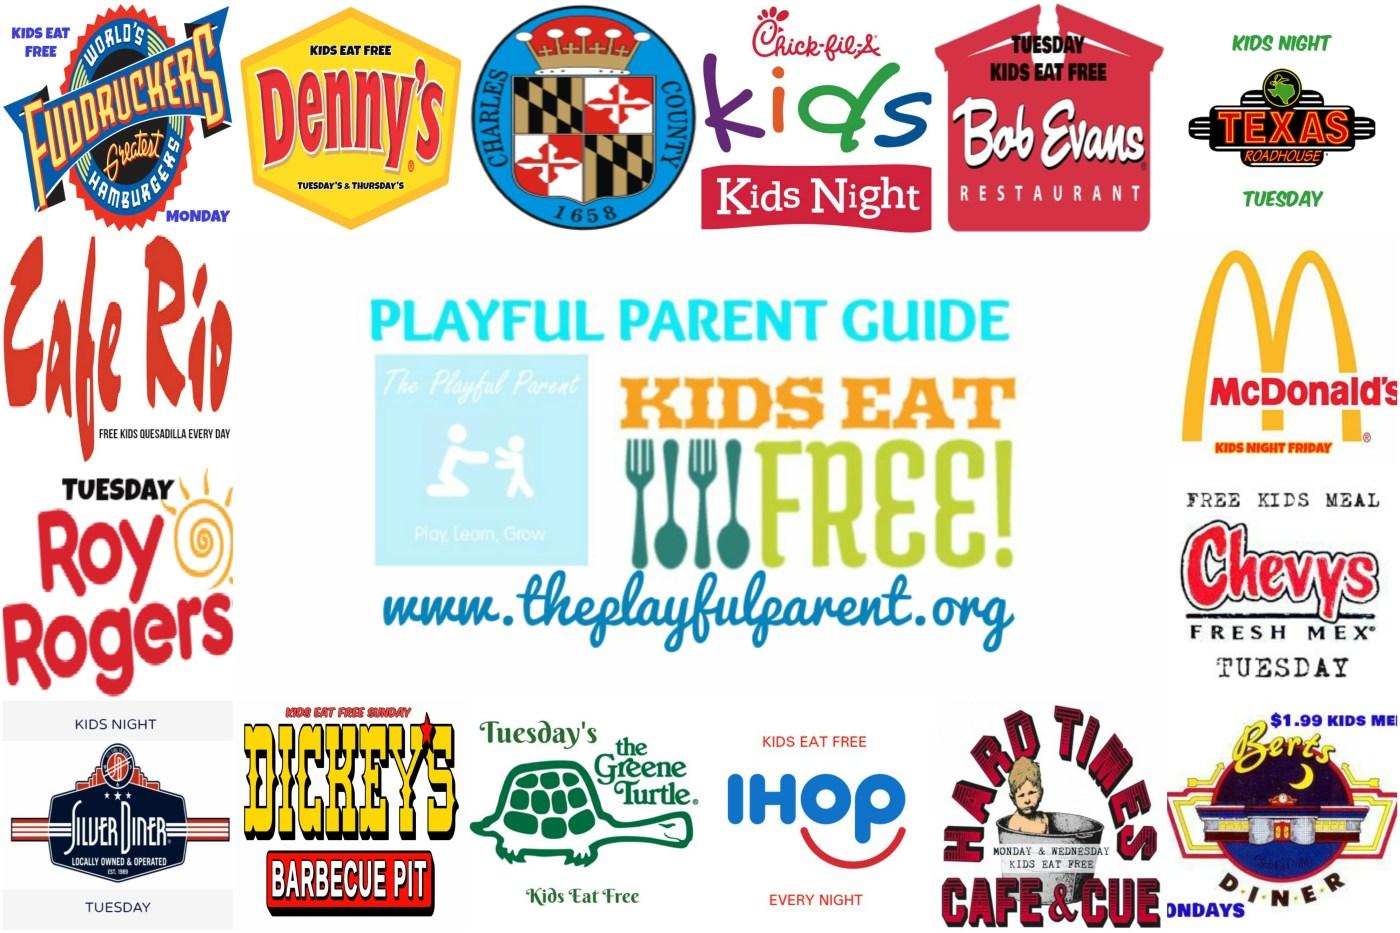 Maryland Kids Eat Free Playful Parent Guide